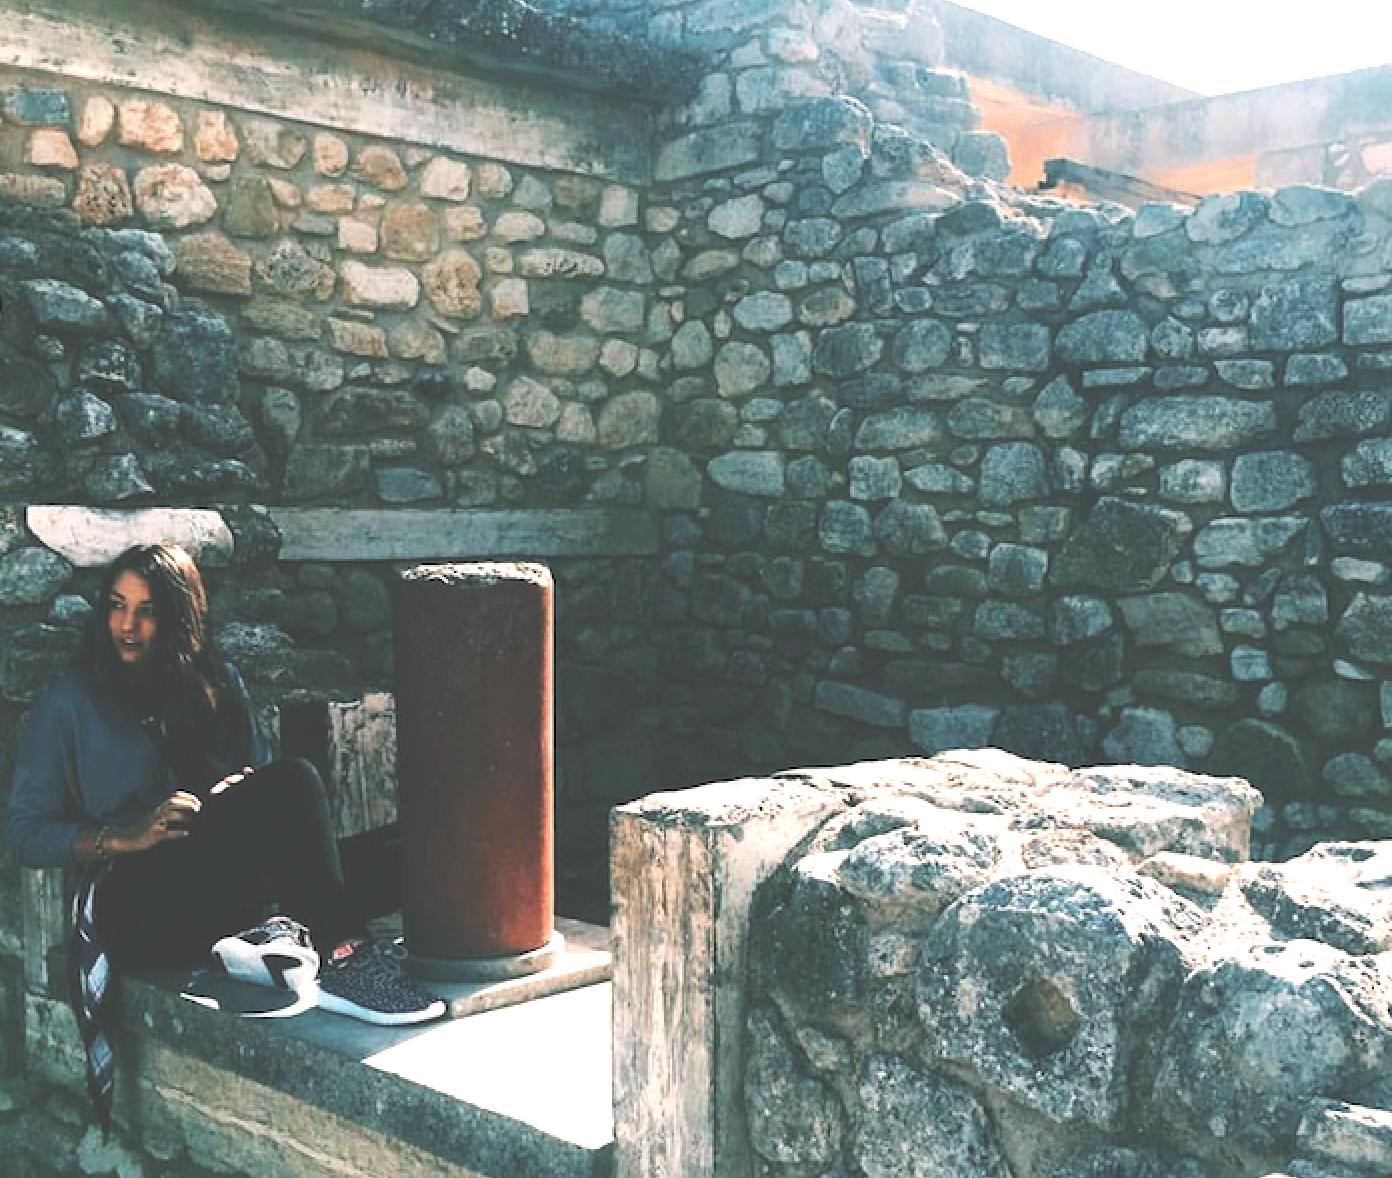 Francesca Bua, English junior, explores ruins in Crete. An avid traveler, Bua has visited 12 countries since beginning her freshman year at Loyola.  (November 2016).